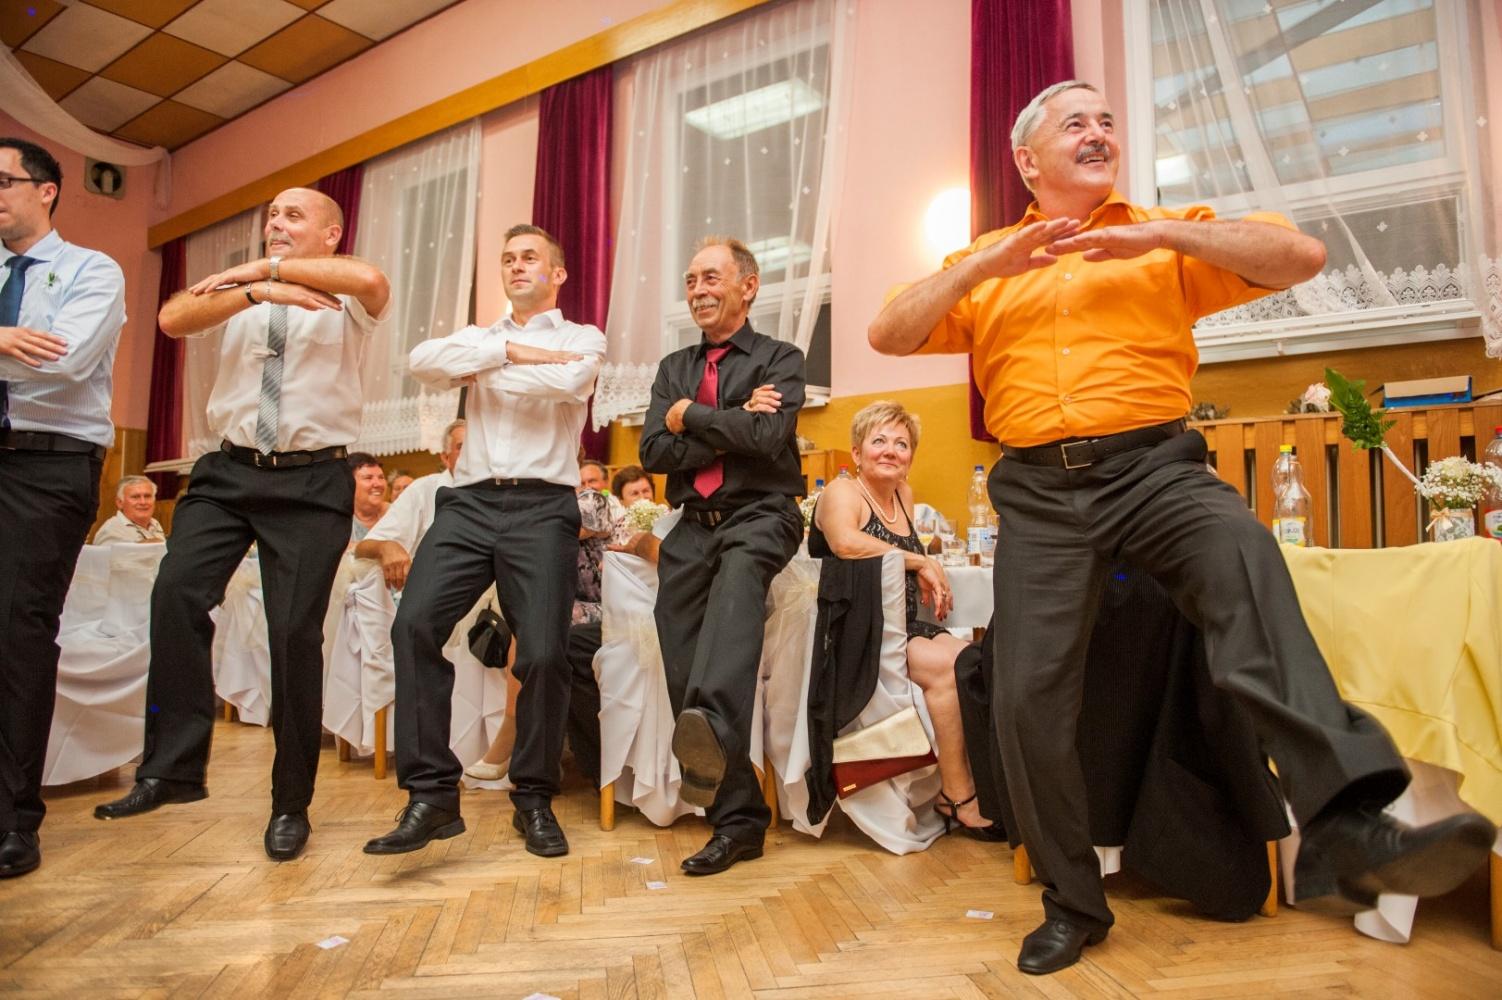 http://www.fotoz.sk/images/gallery-21/normal/svadobne-fotenie_eskuvoi-fotos_376.jpg